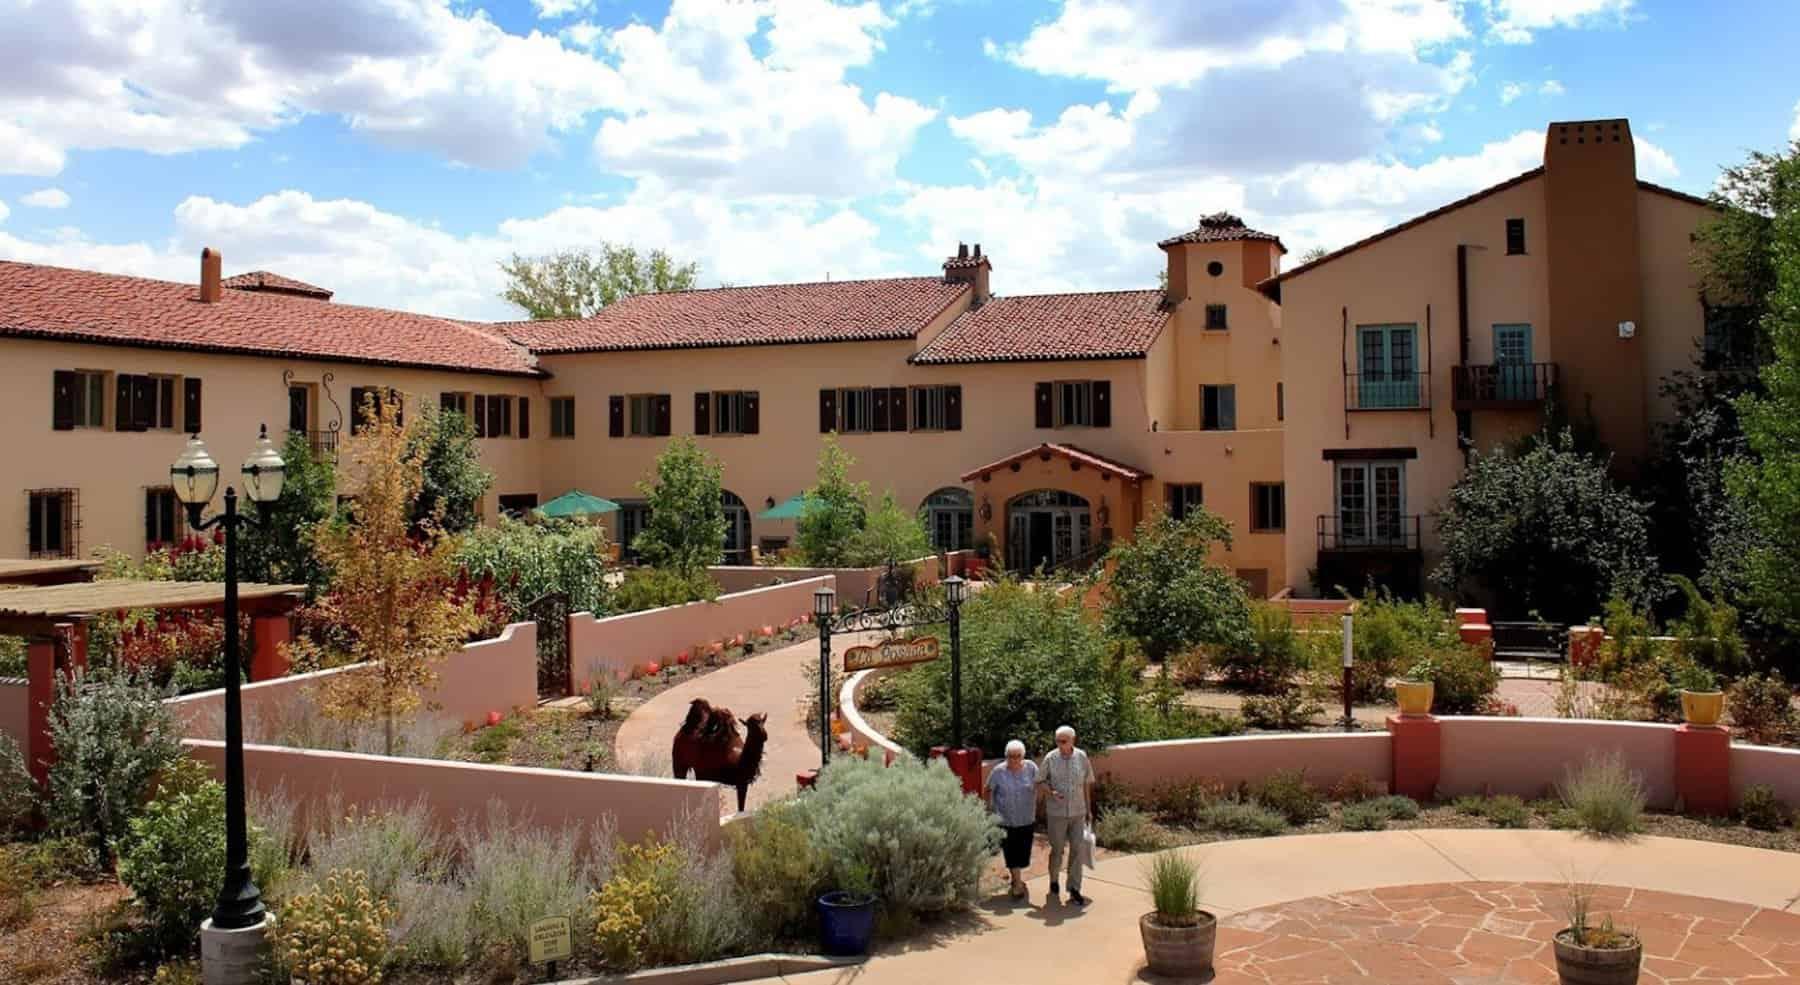 la posada hotel in winslow arizona is a popular thing to do